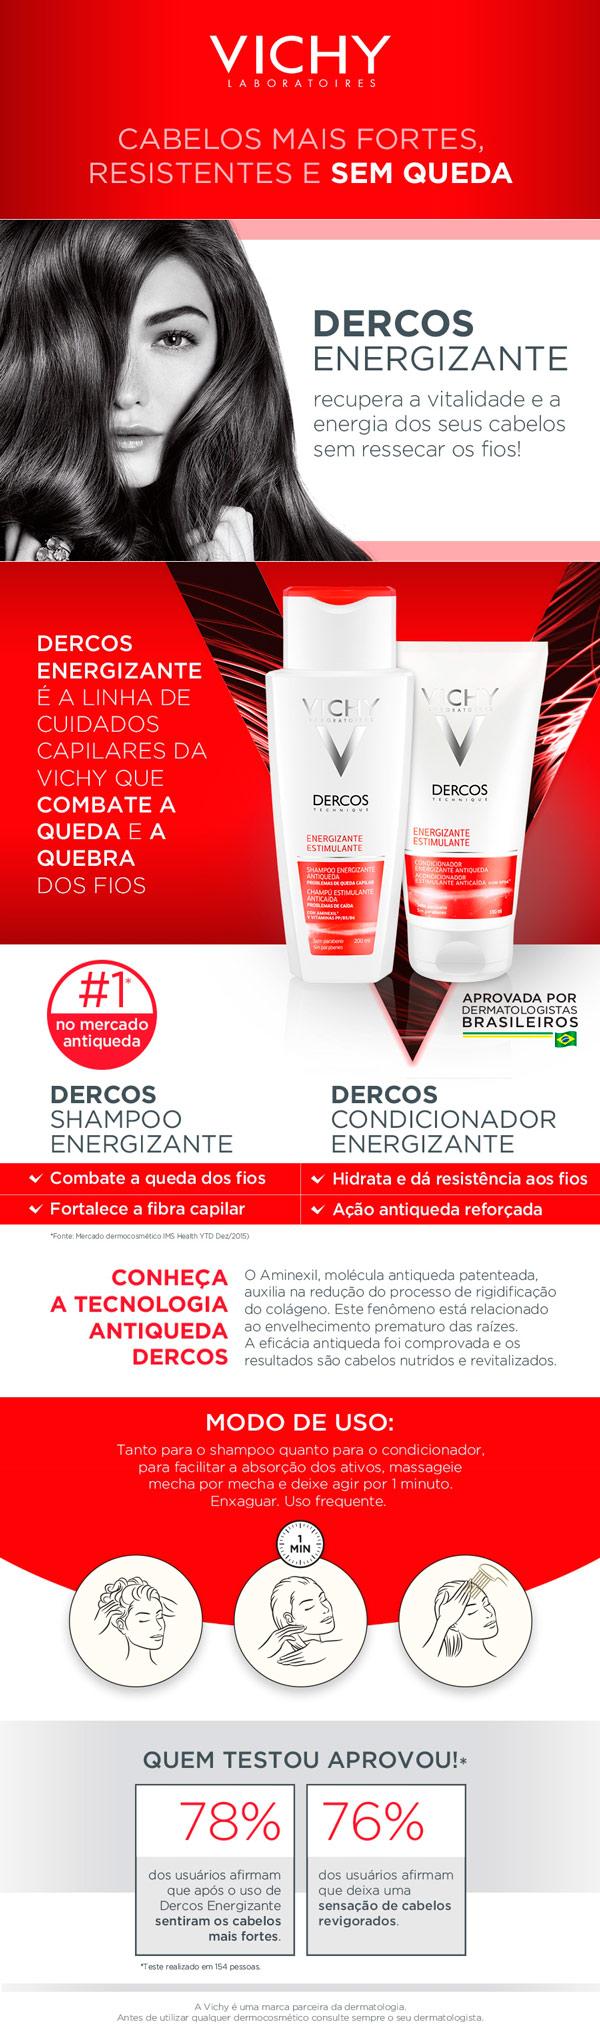 Dercos Energizante Vichy Shampoo Energizante Antiqueda Leve 400ml Pague 300ml